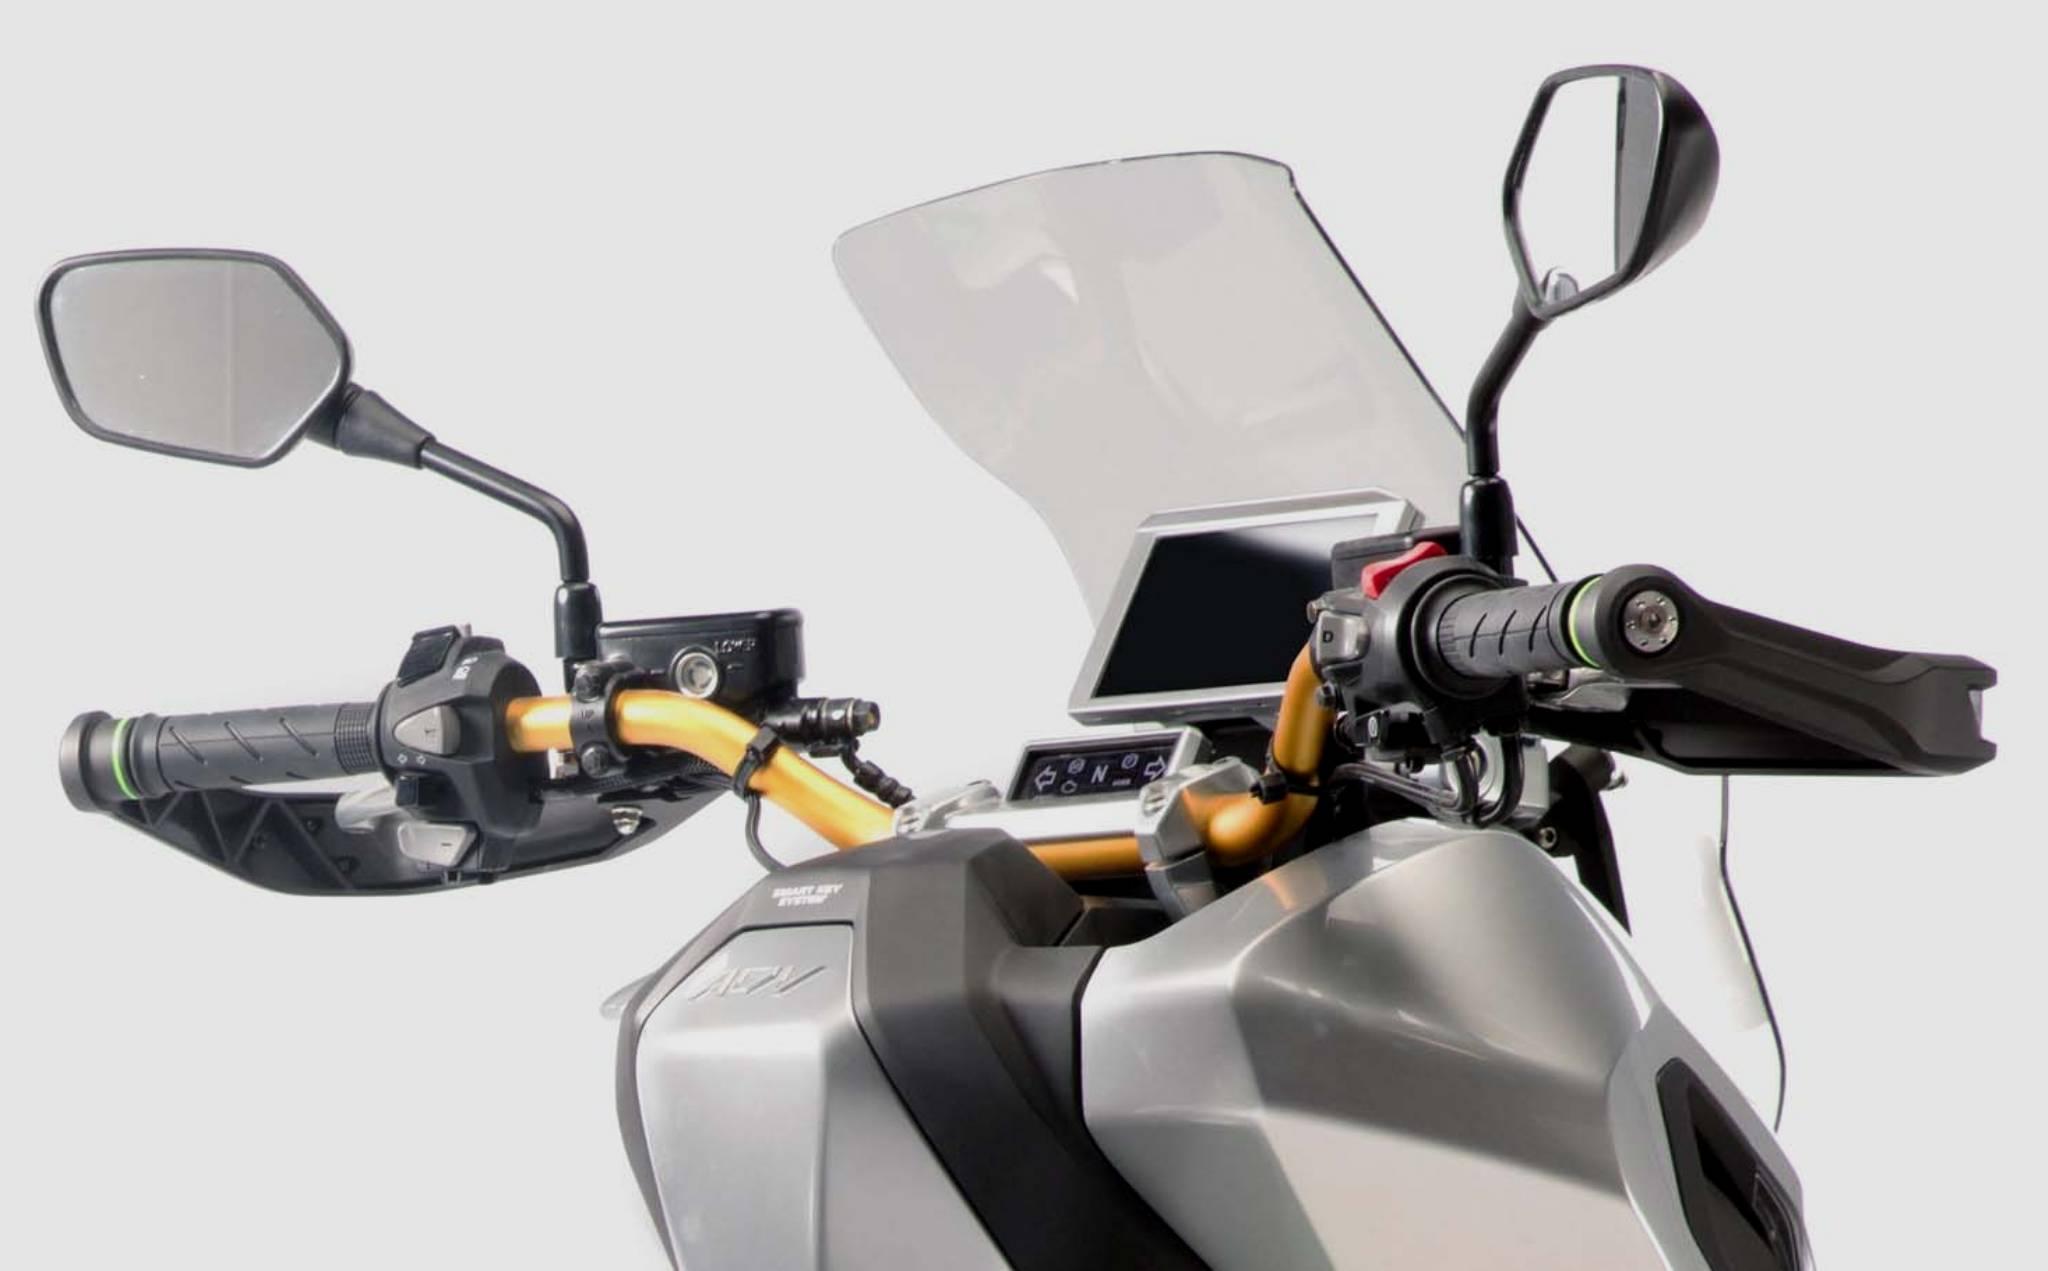 Honda to produce X-ADV dual-purpose super-scooter? Image 450103